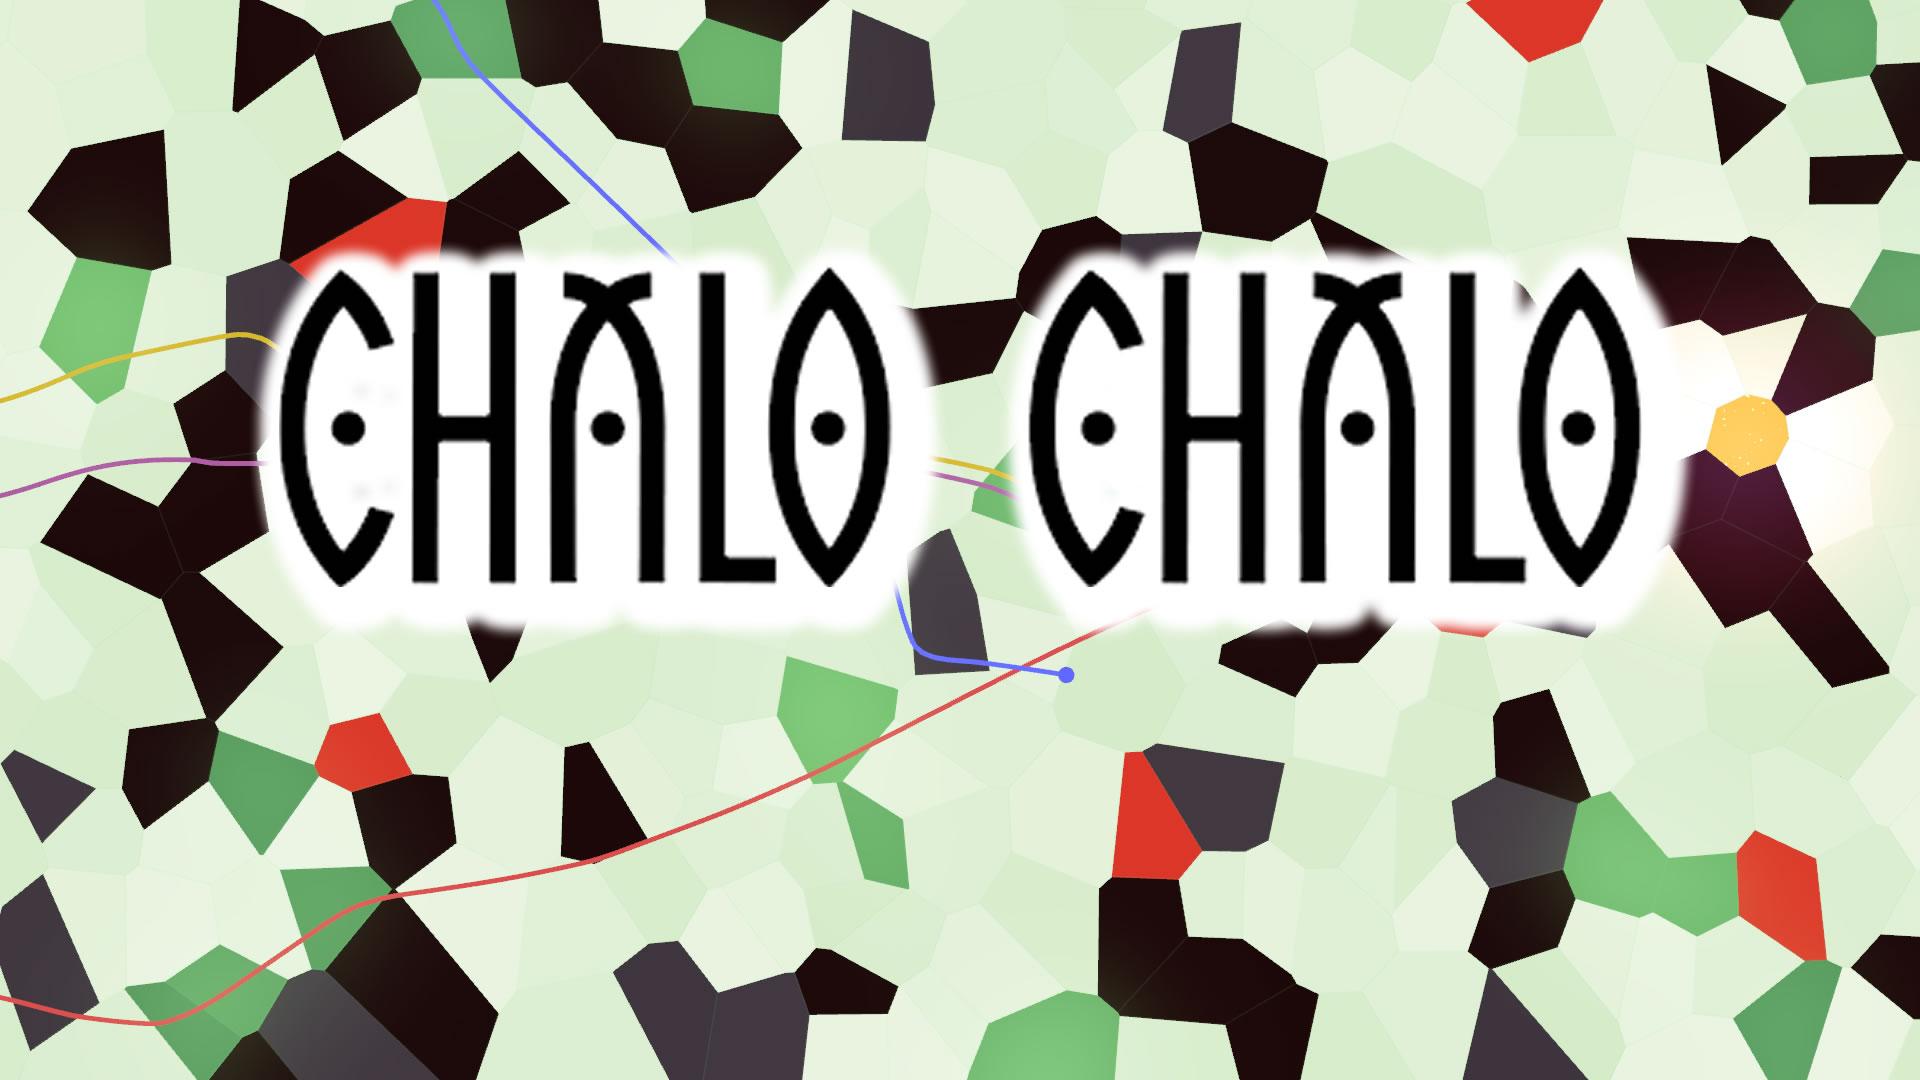 [GC15] Interview – Richard Boeser (Chalo Chalo) [VOSTFR]